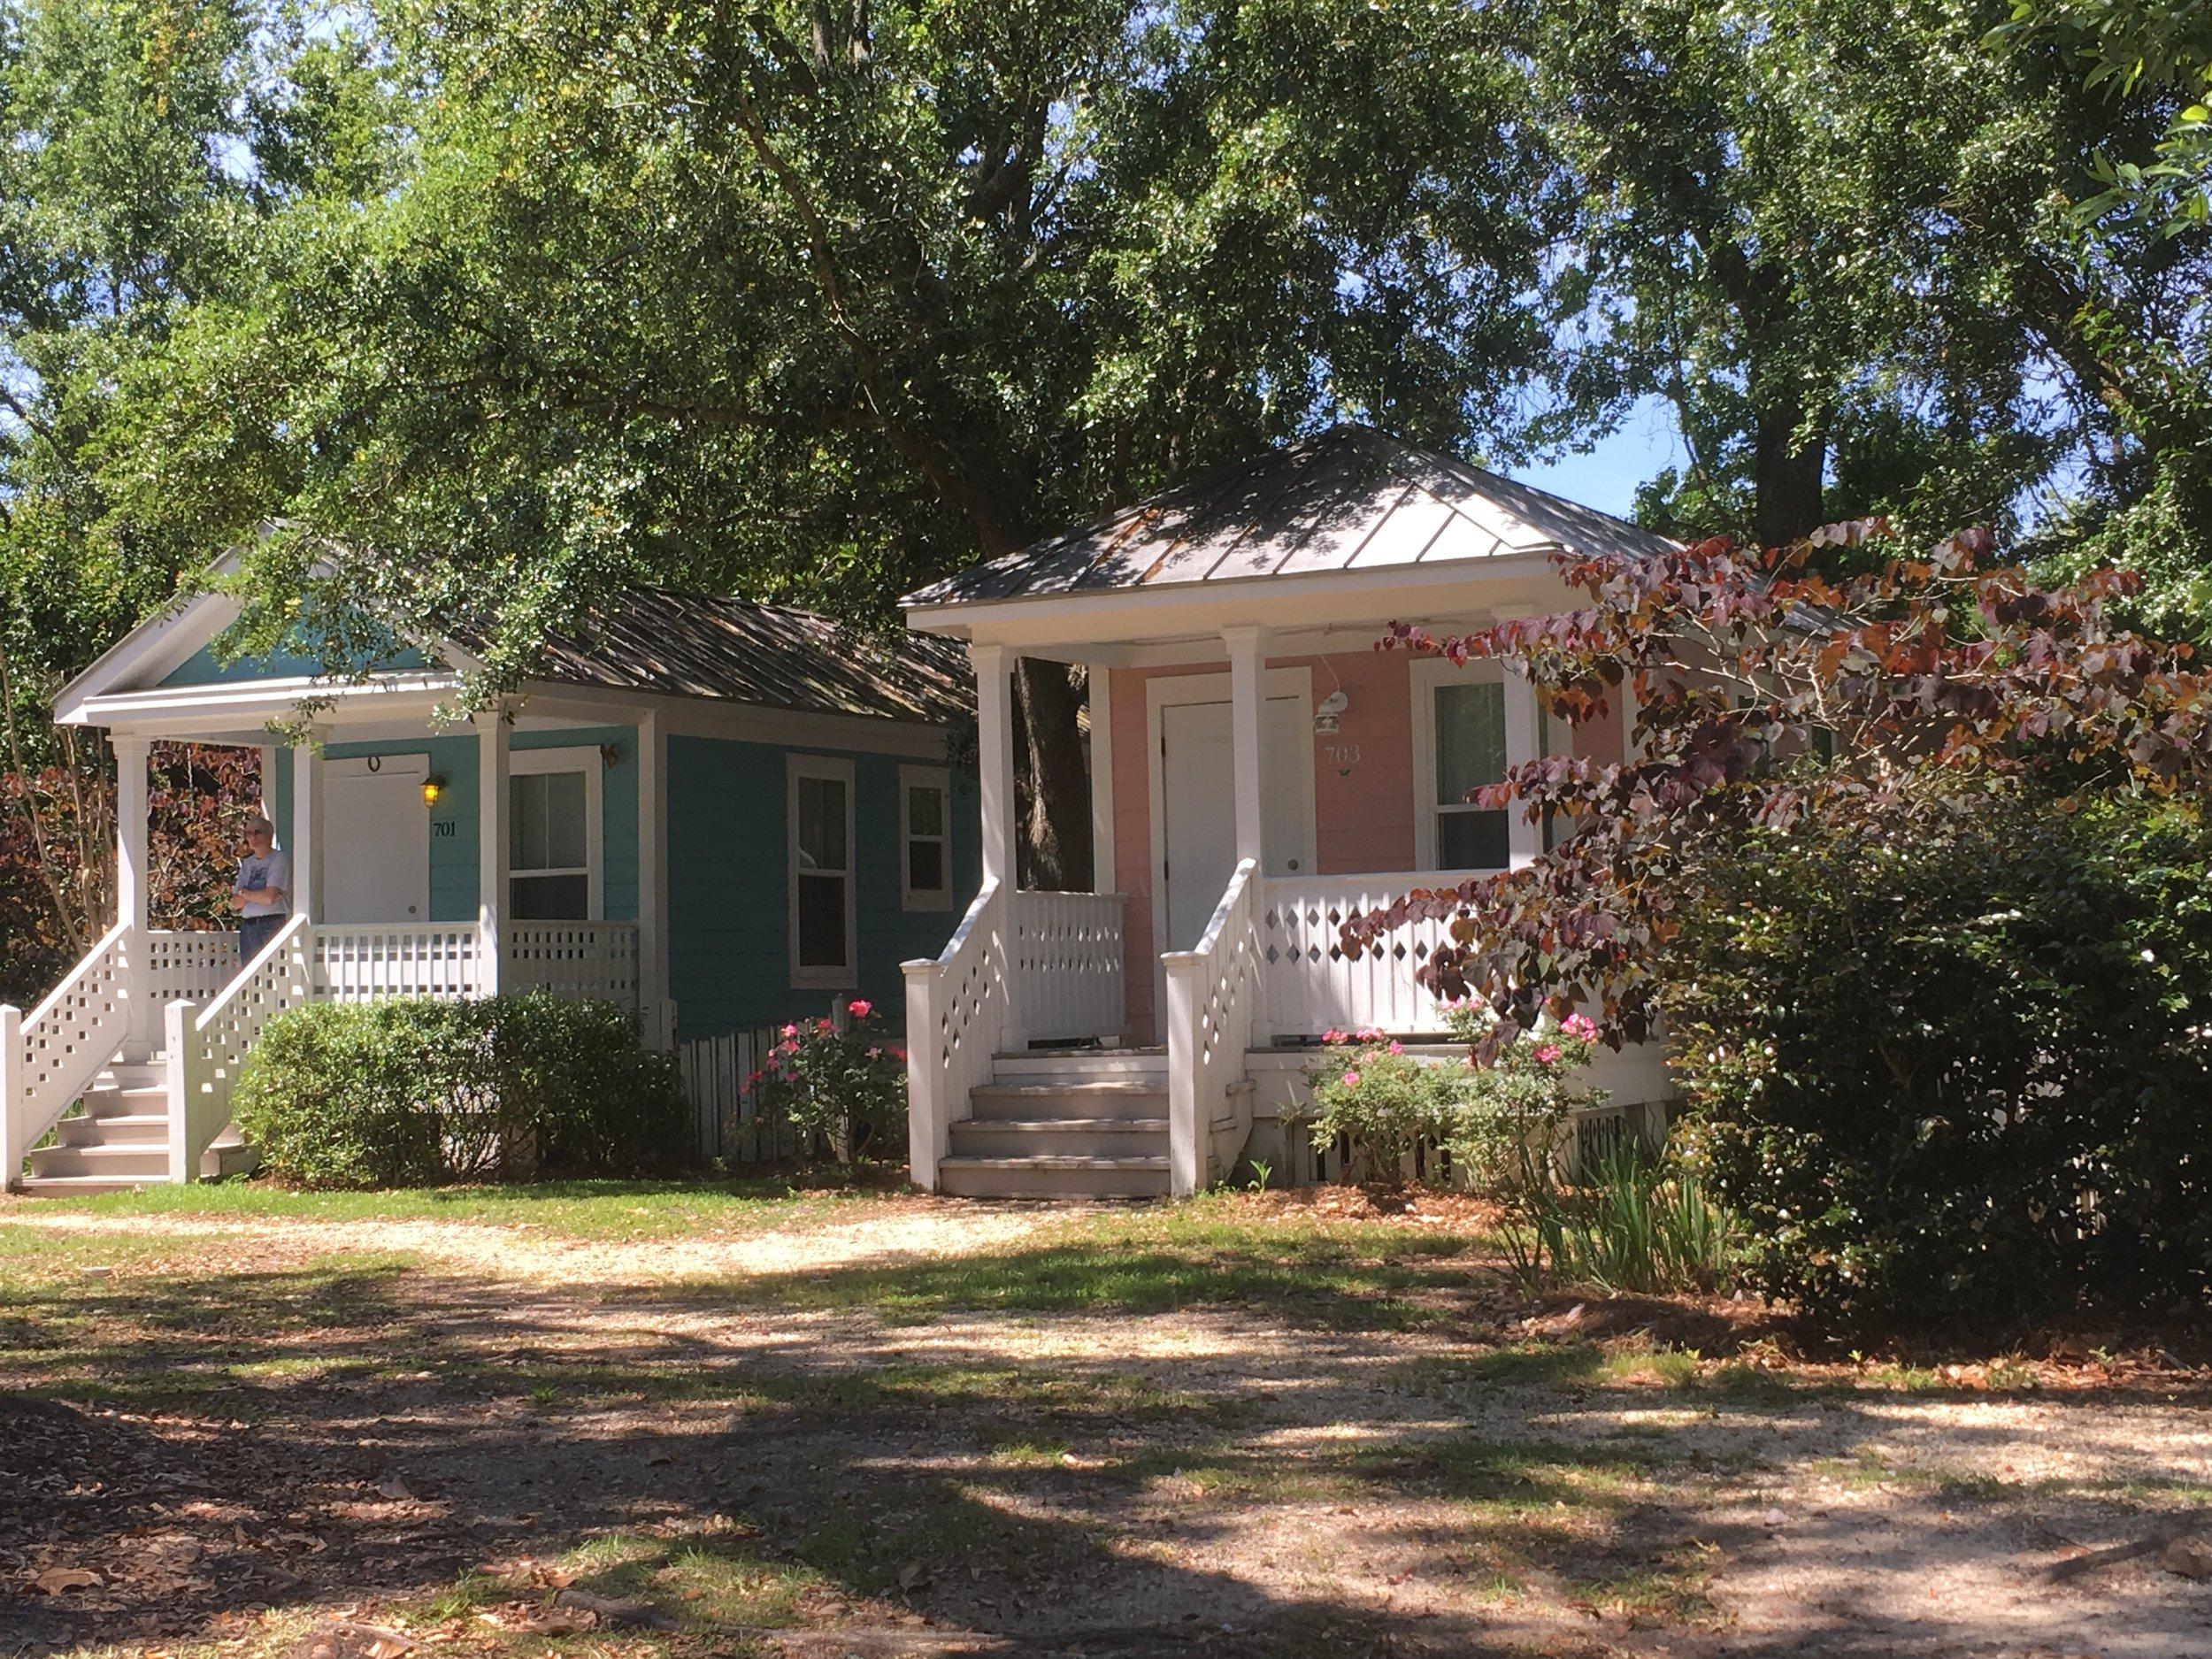 Cottage Square in Ocean Springs, MS